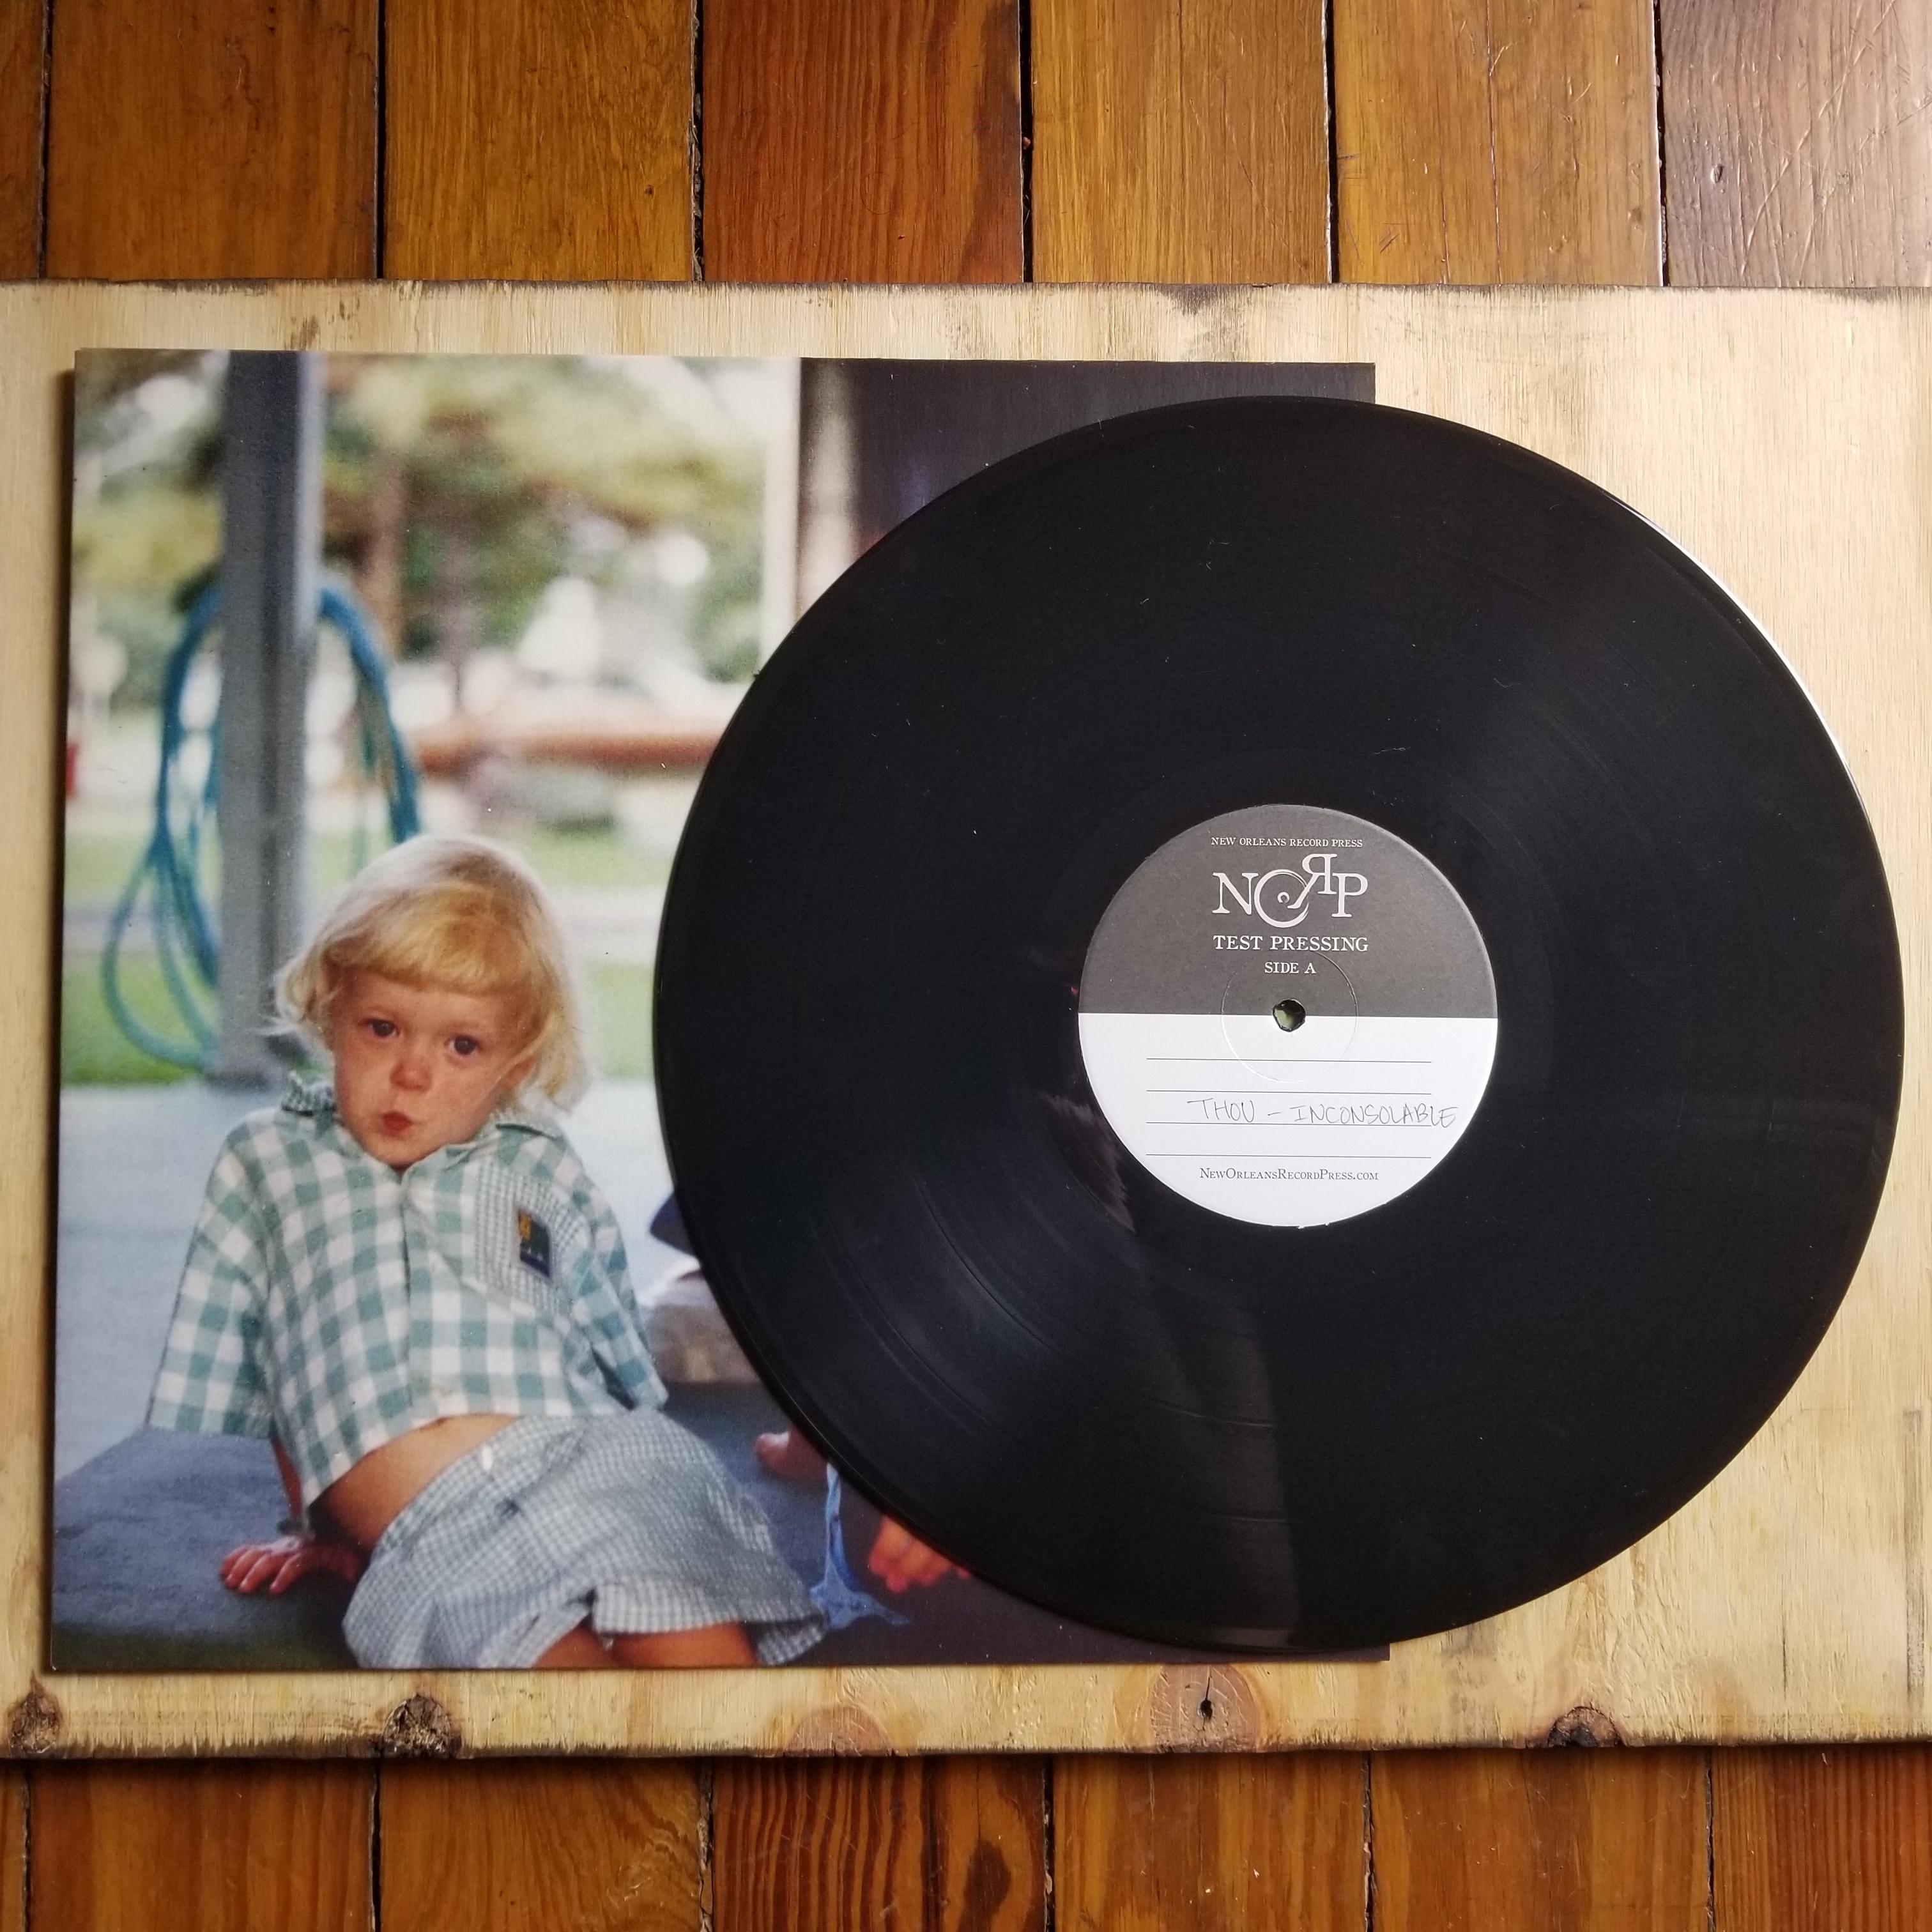 community records - test pressing - thou - inconsolable - vinyl